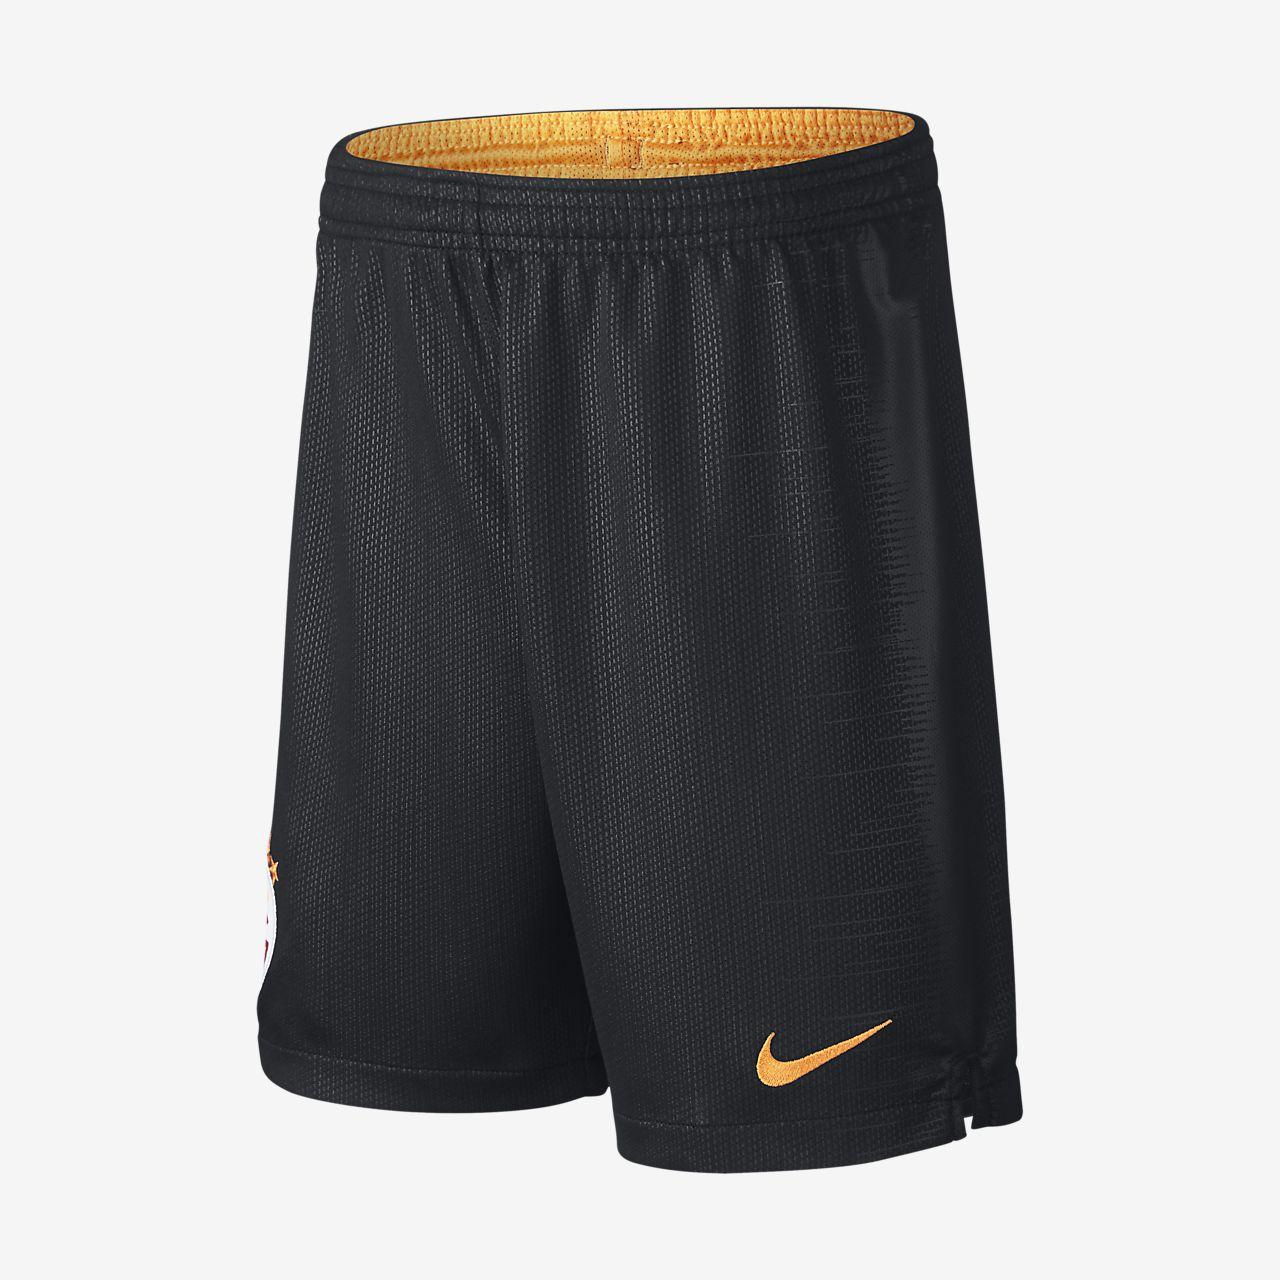 2018/19 Galatasaray S.K. Stadium Home/Away Older Kids' Football Shorts